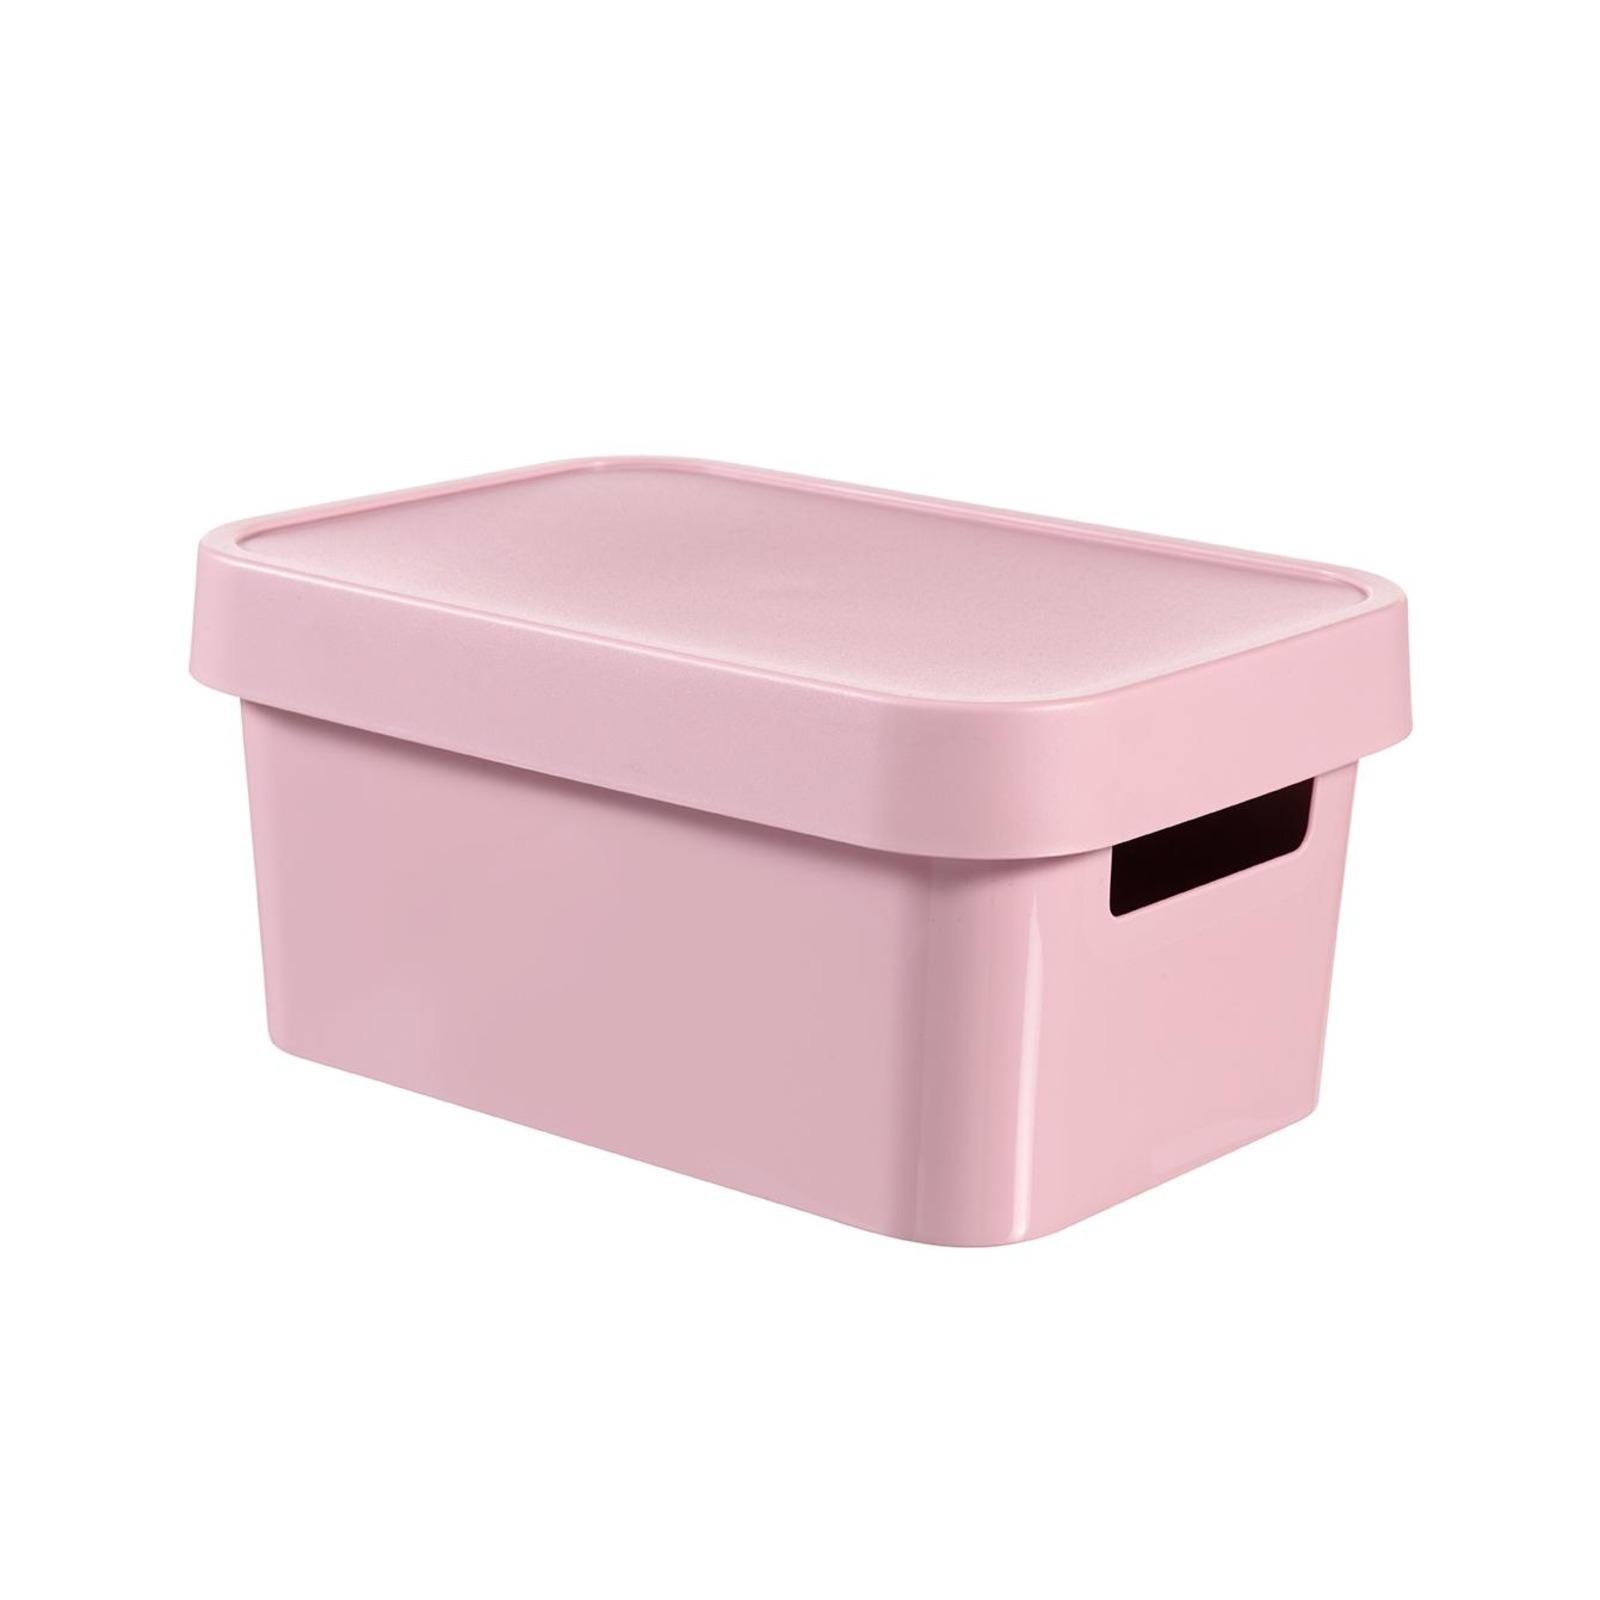 CURVER Infinity Box  4.5L + Lid Pink